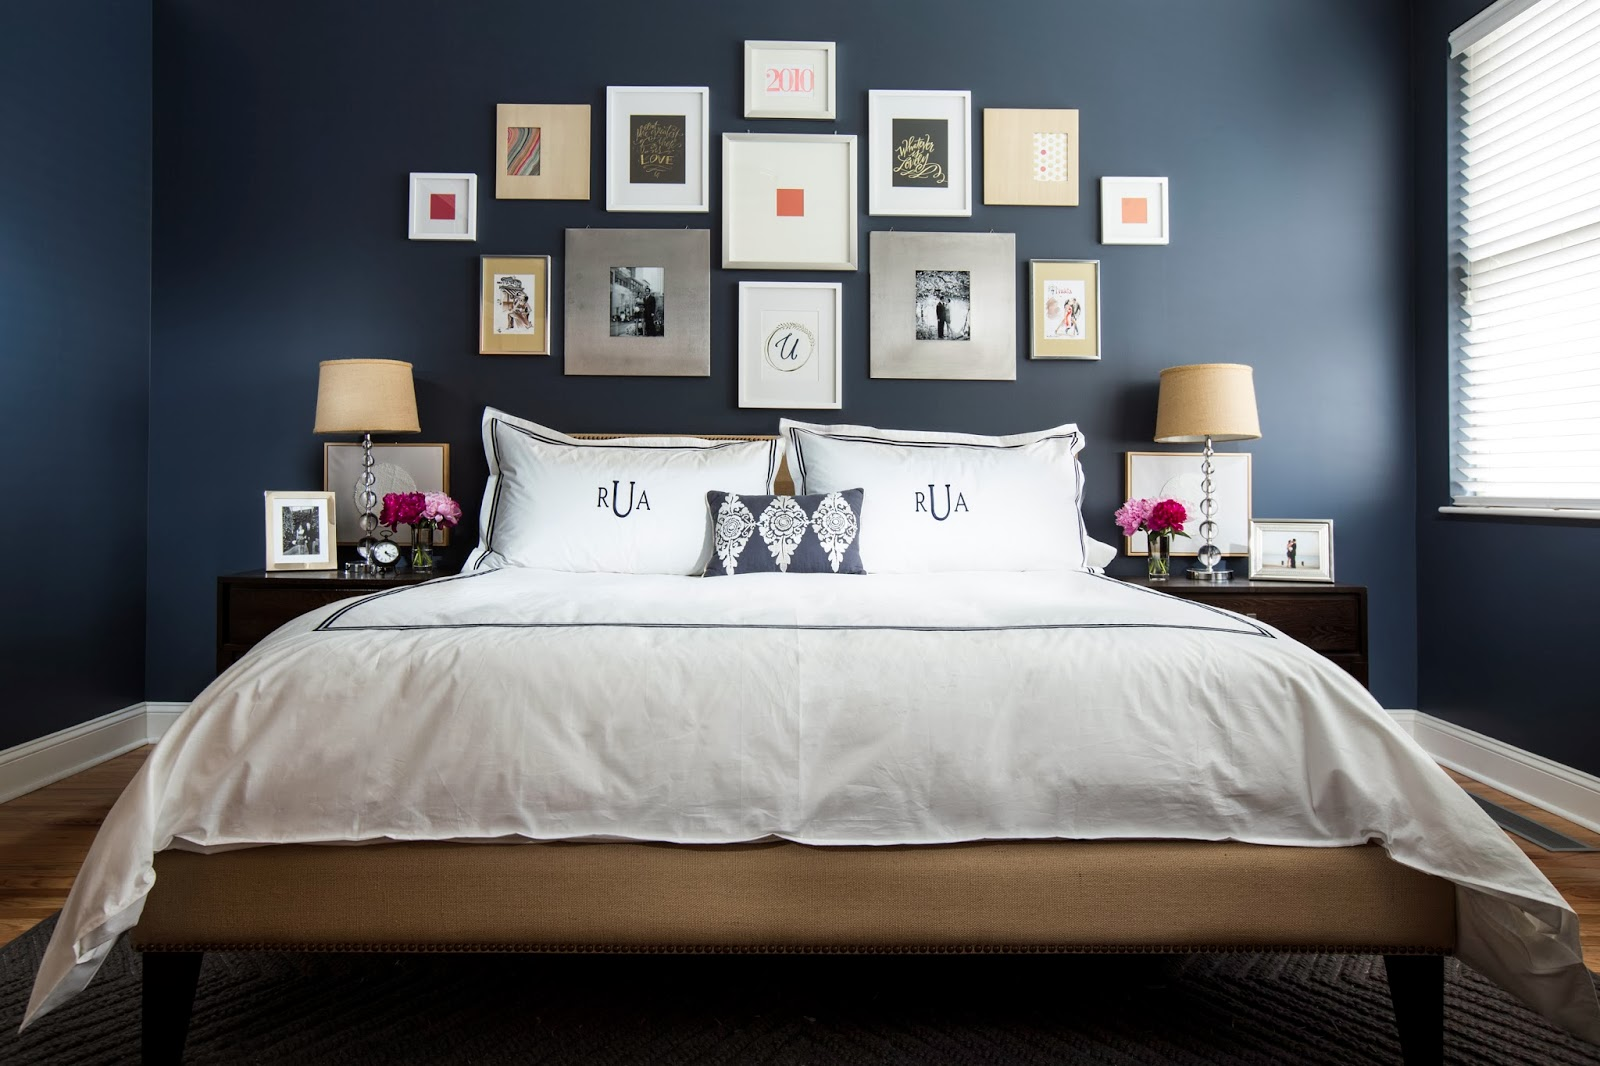 navy amp blue bedroom design ideas amp pictures Dark Blue Bedroom Ideas id=79858